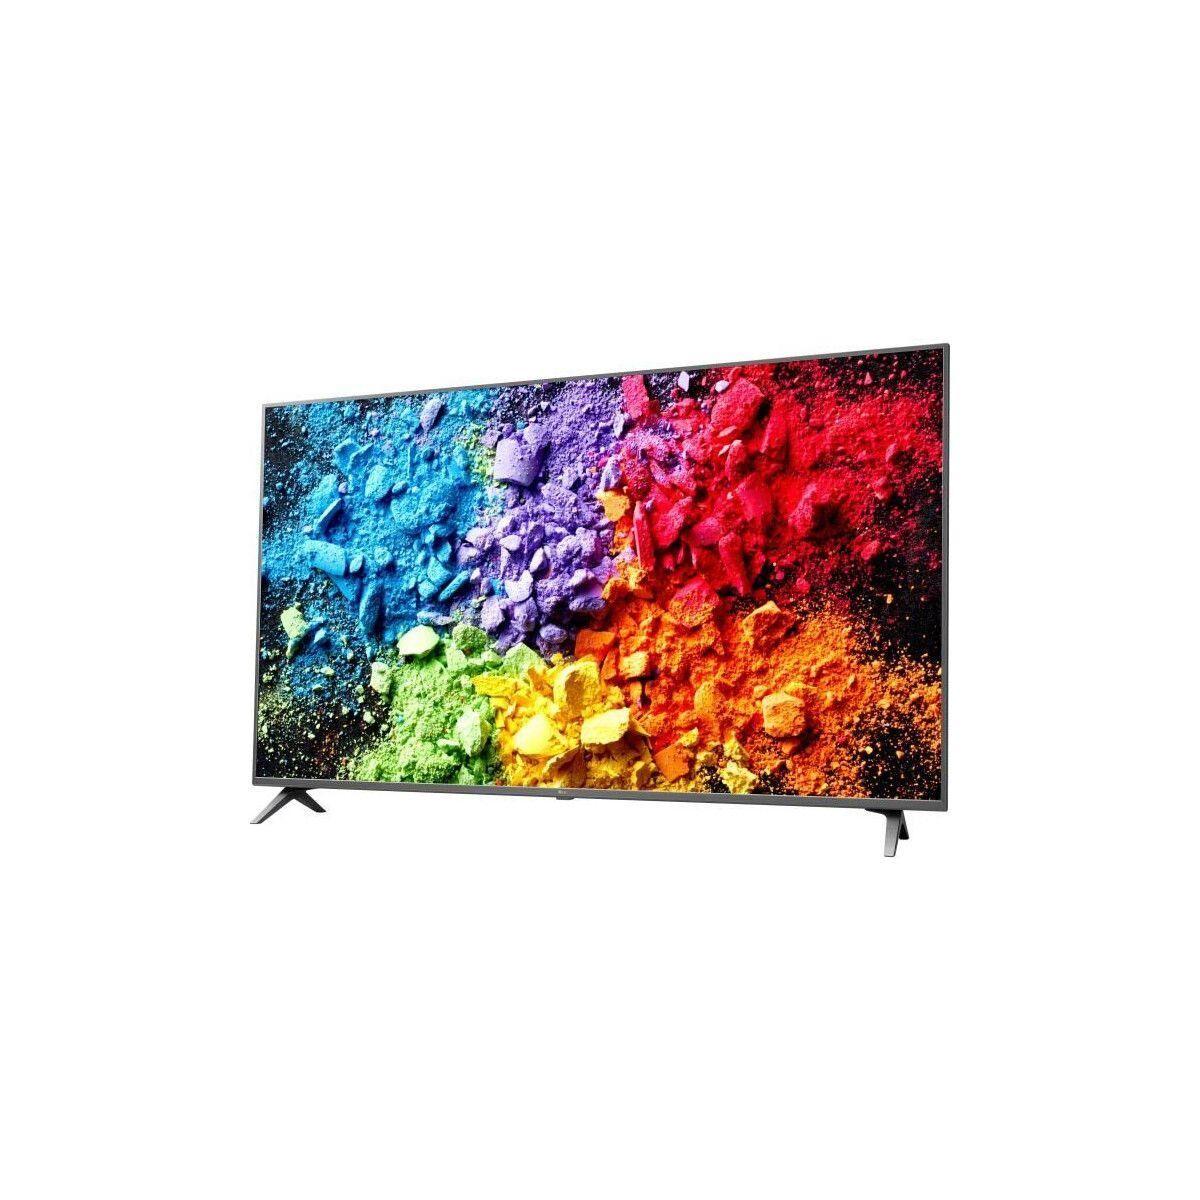 LG 65SK8000 TV LED 4K SUPER UHD NANO CELL Display 164 cm 65 - SMART TV - 4 x HDMI - 3 x USB - Classe energetique A+